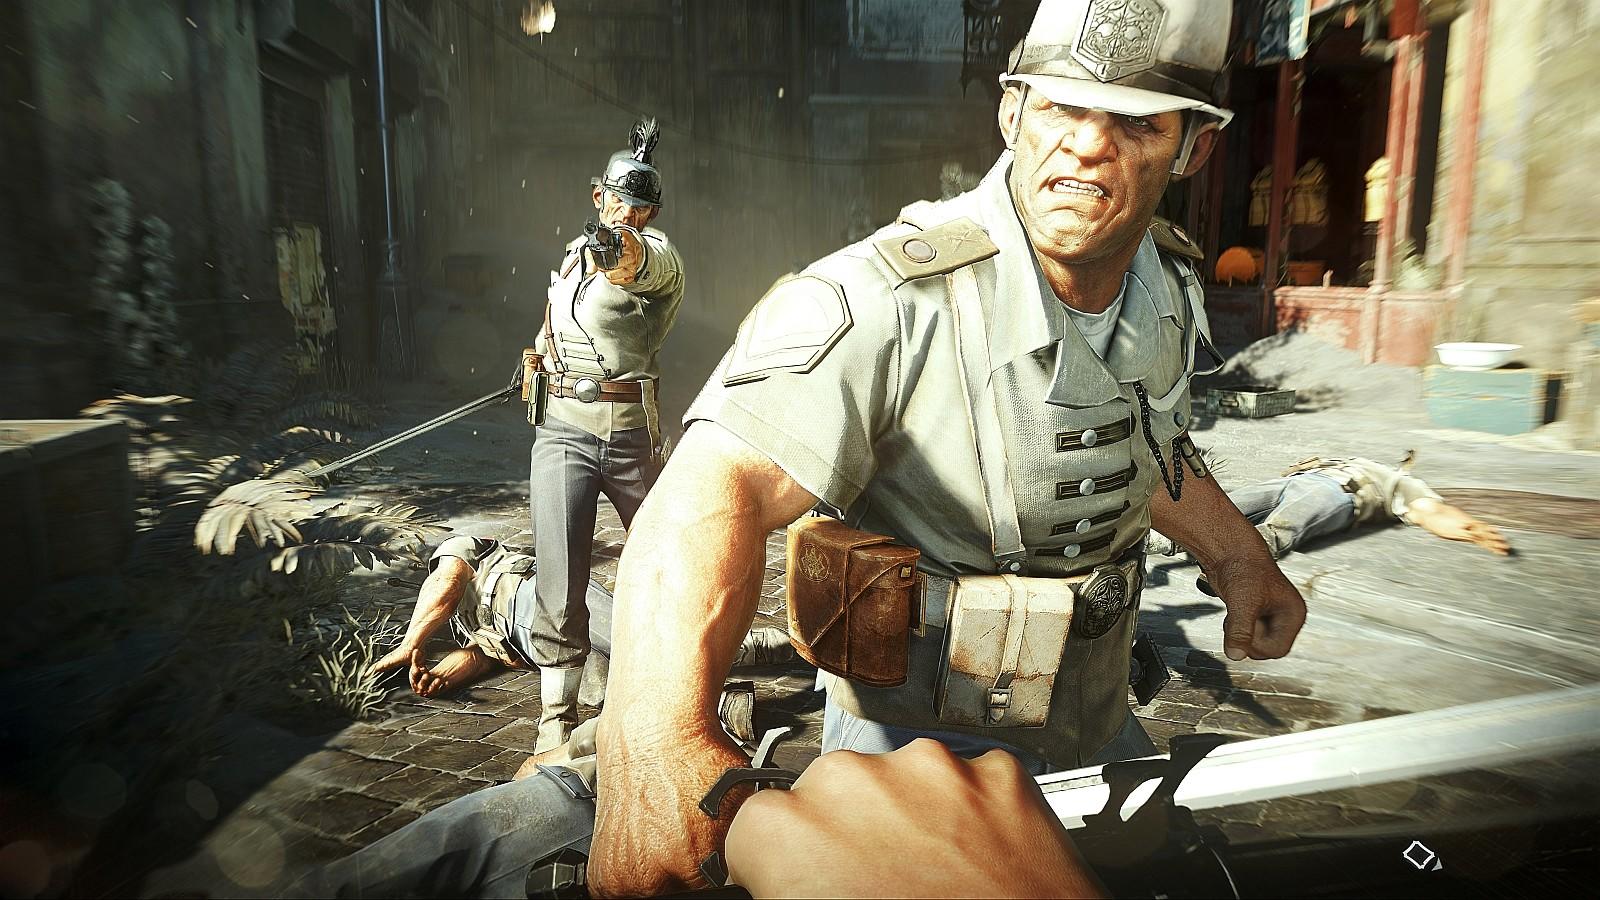 Computer Games Dishonored 2-BlackBox - Shameful 2